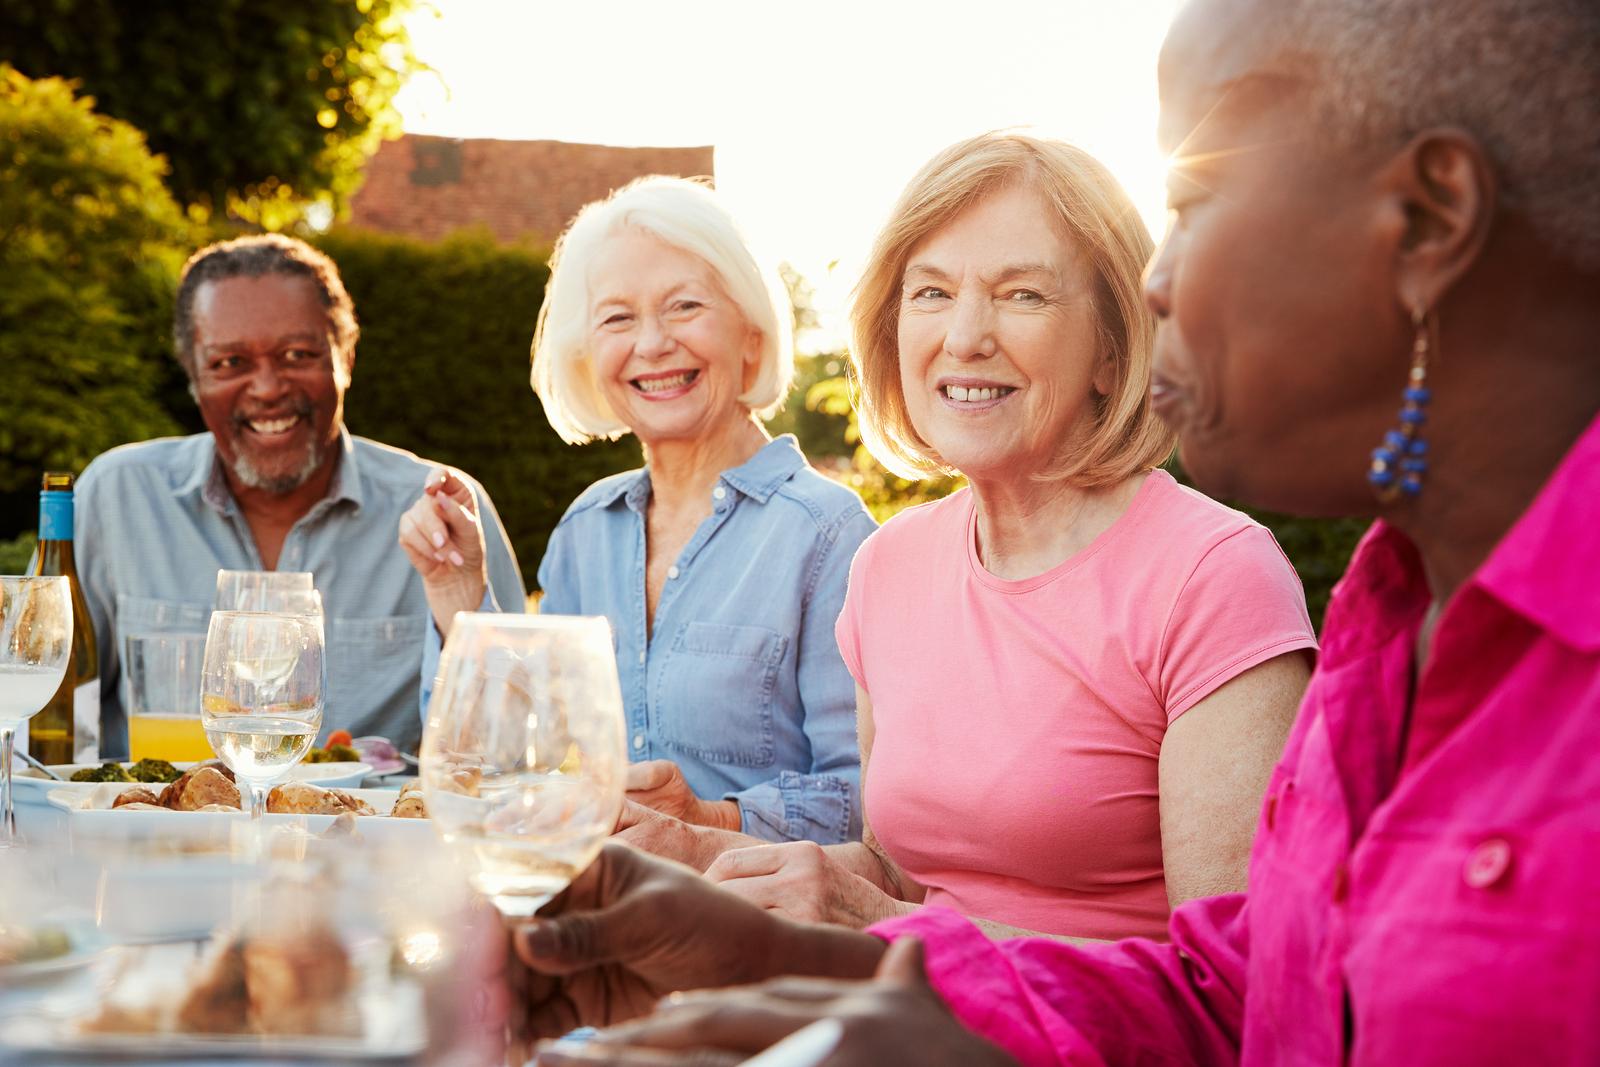 Group of seniors enjoying a social activity